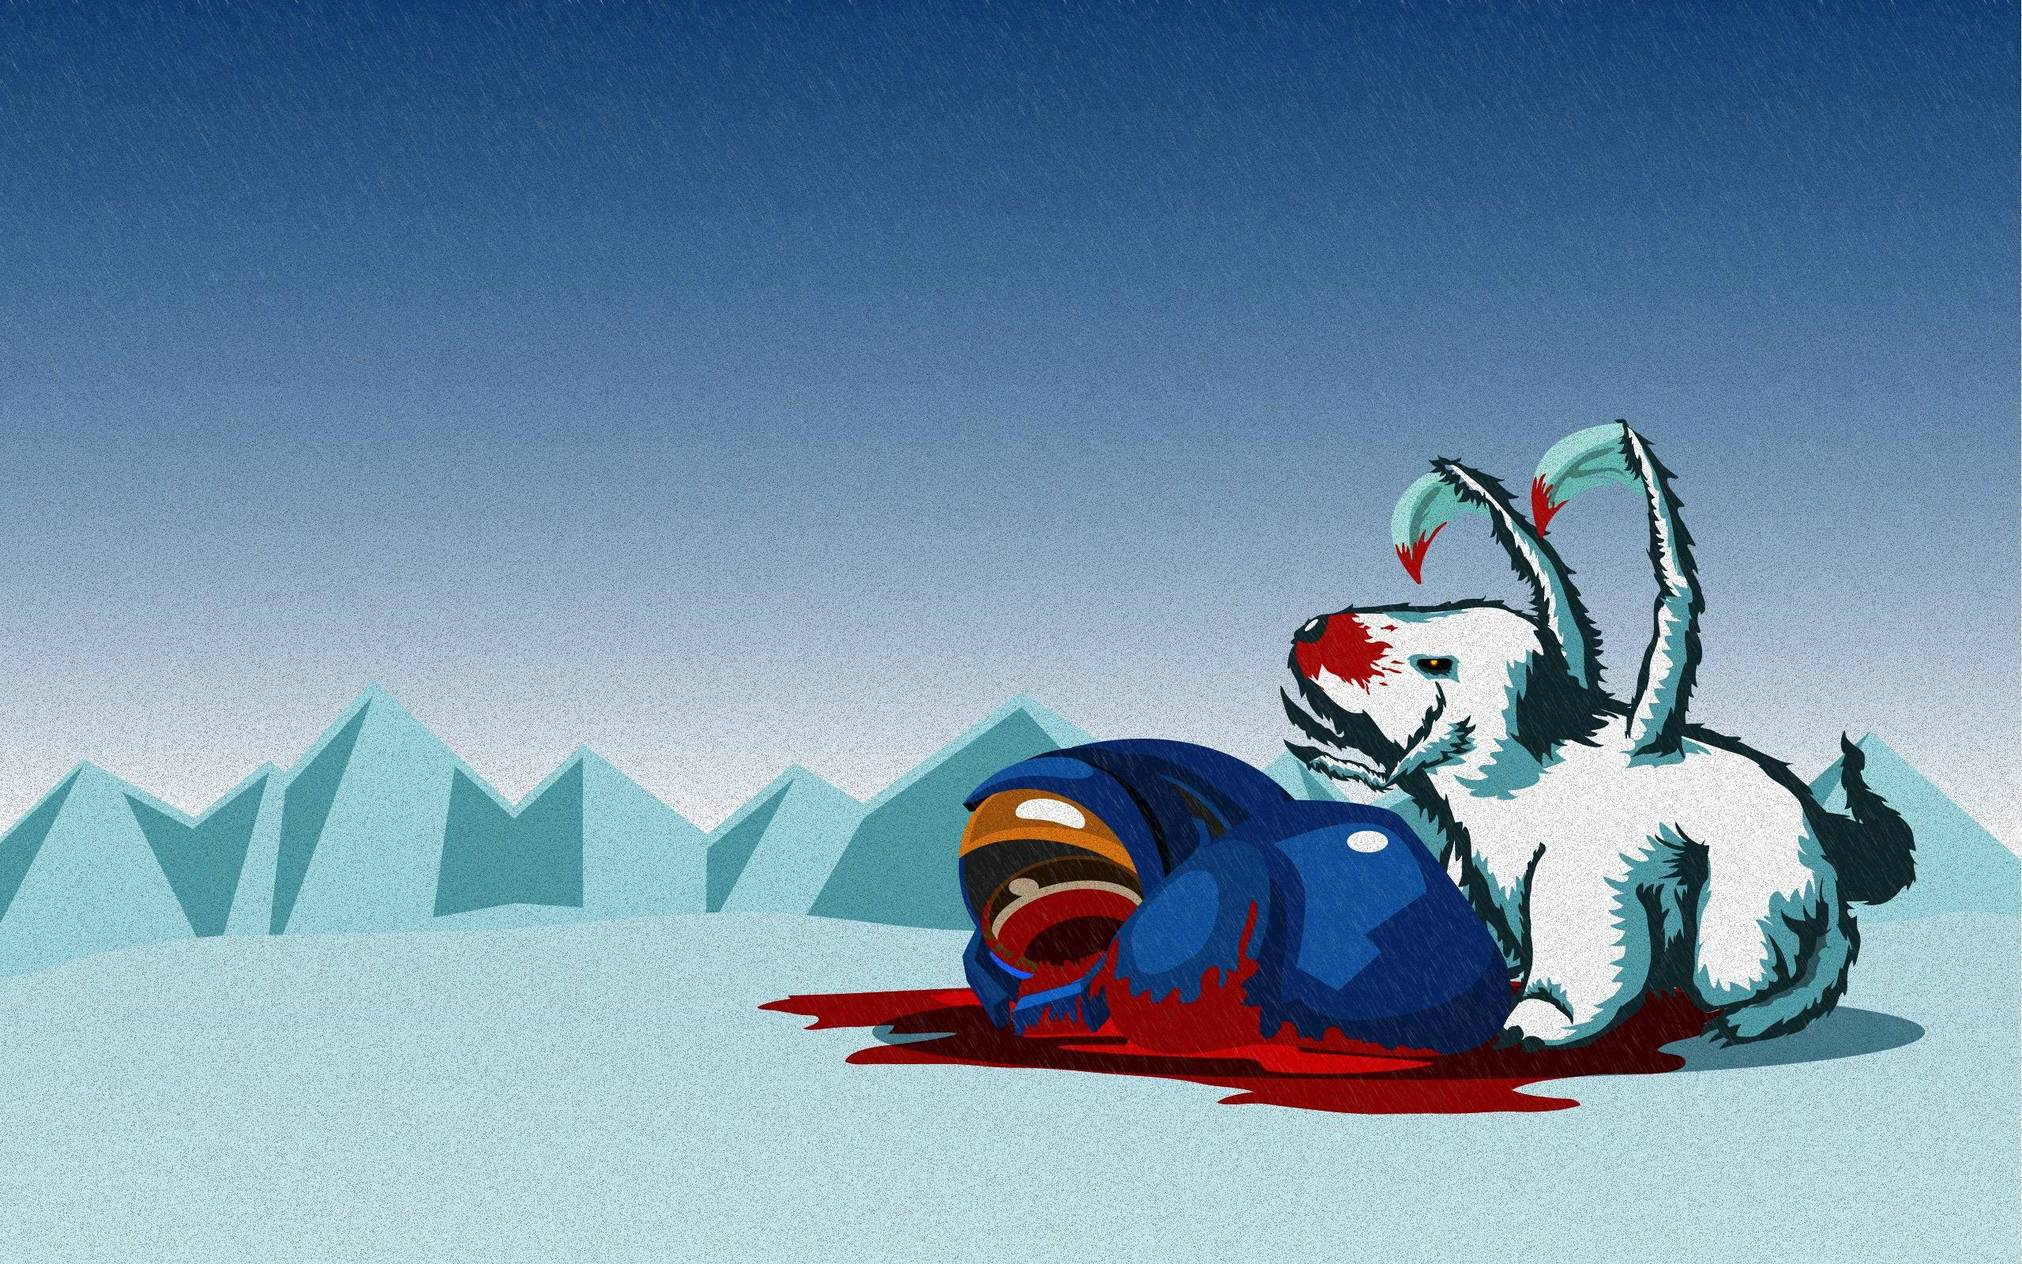 zergling polar.jpg